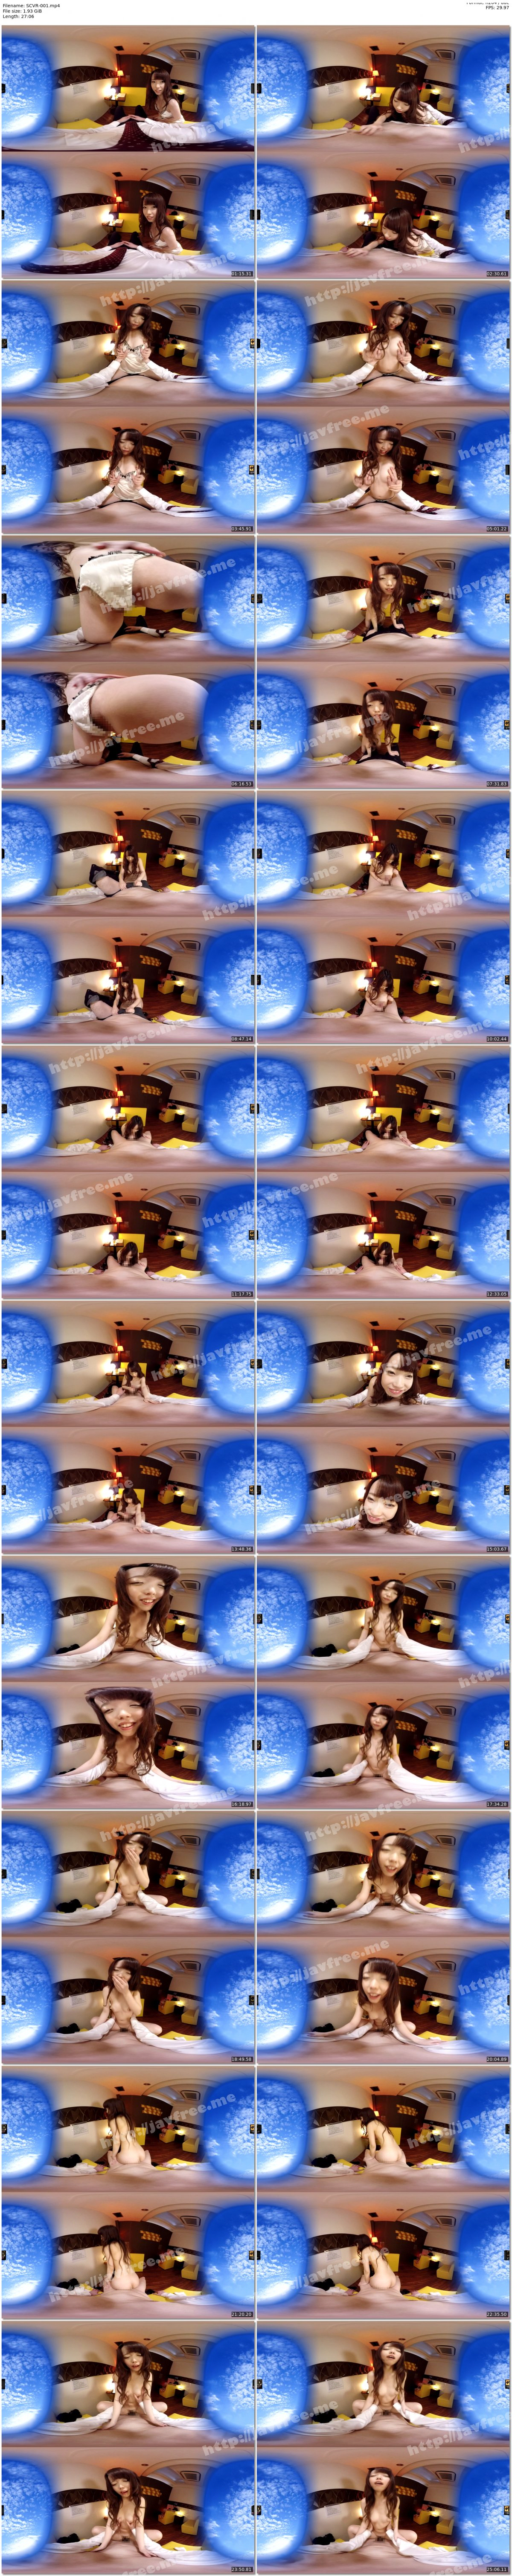 [SCVR-001] 【VR】SCOOP×VR バレたら100万円!?店長に内緒でその場で生中出しSEX - image SCVR-001 on https://javfree.me